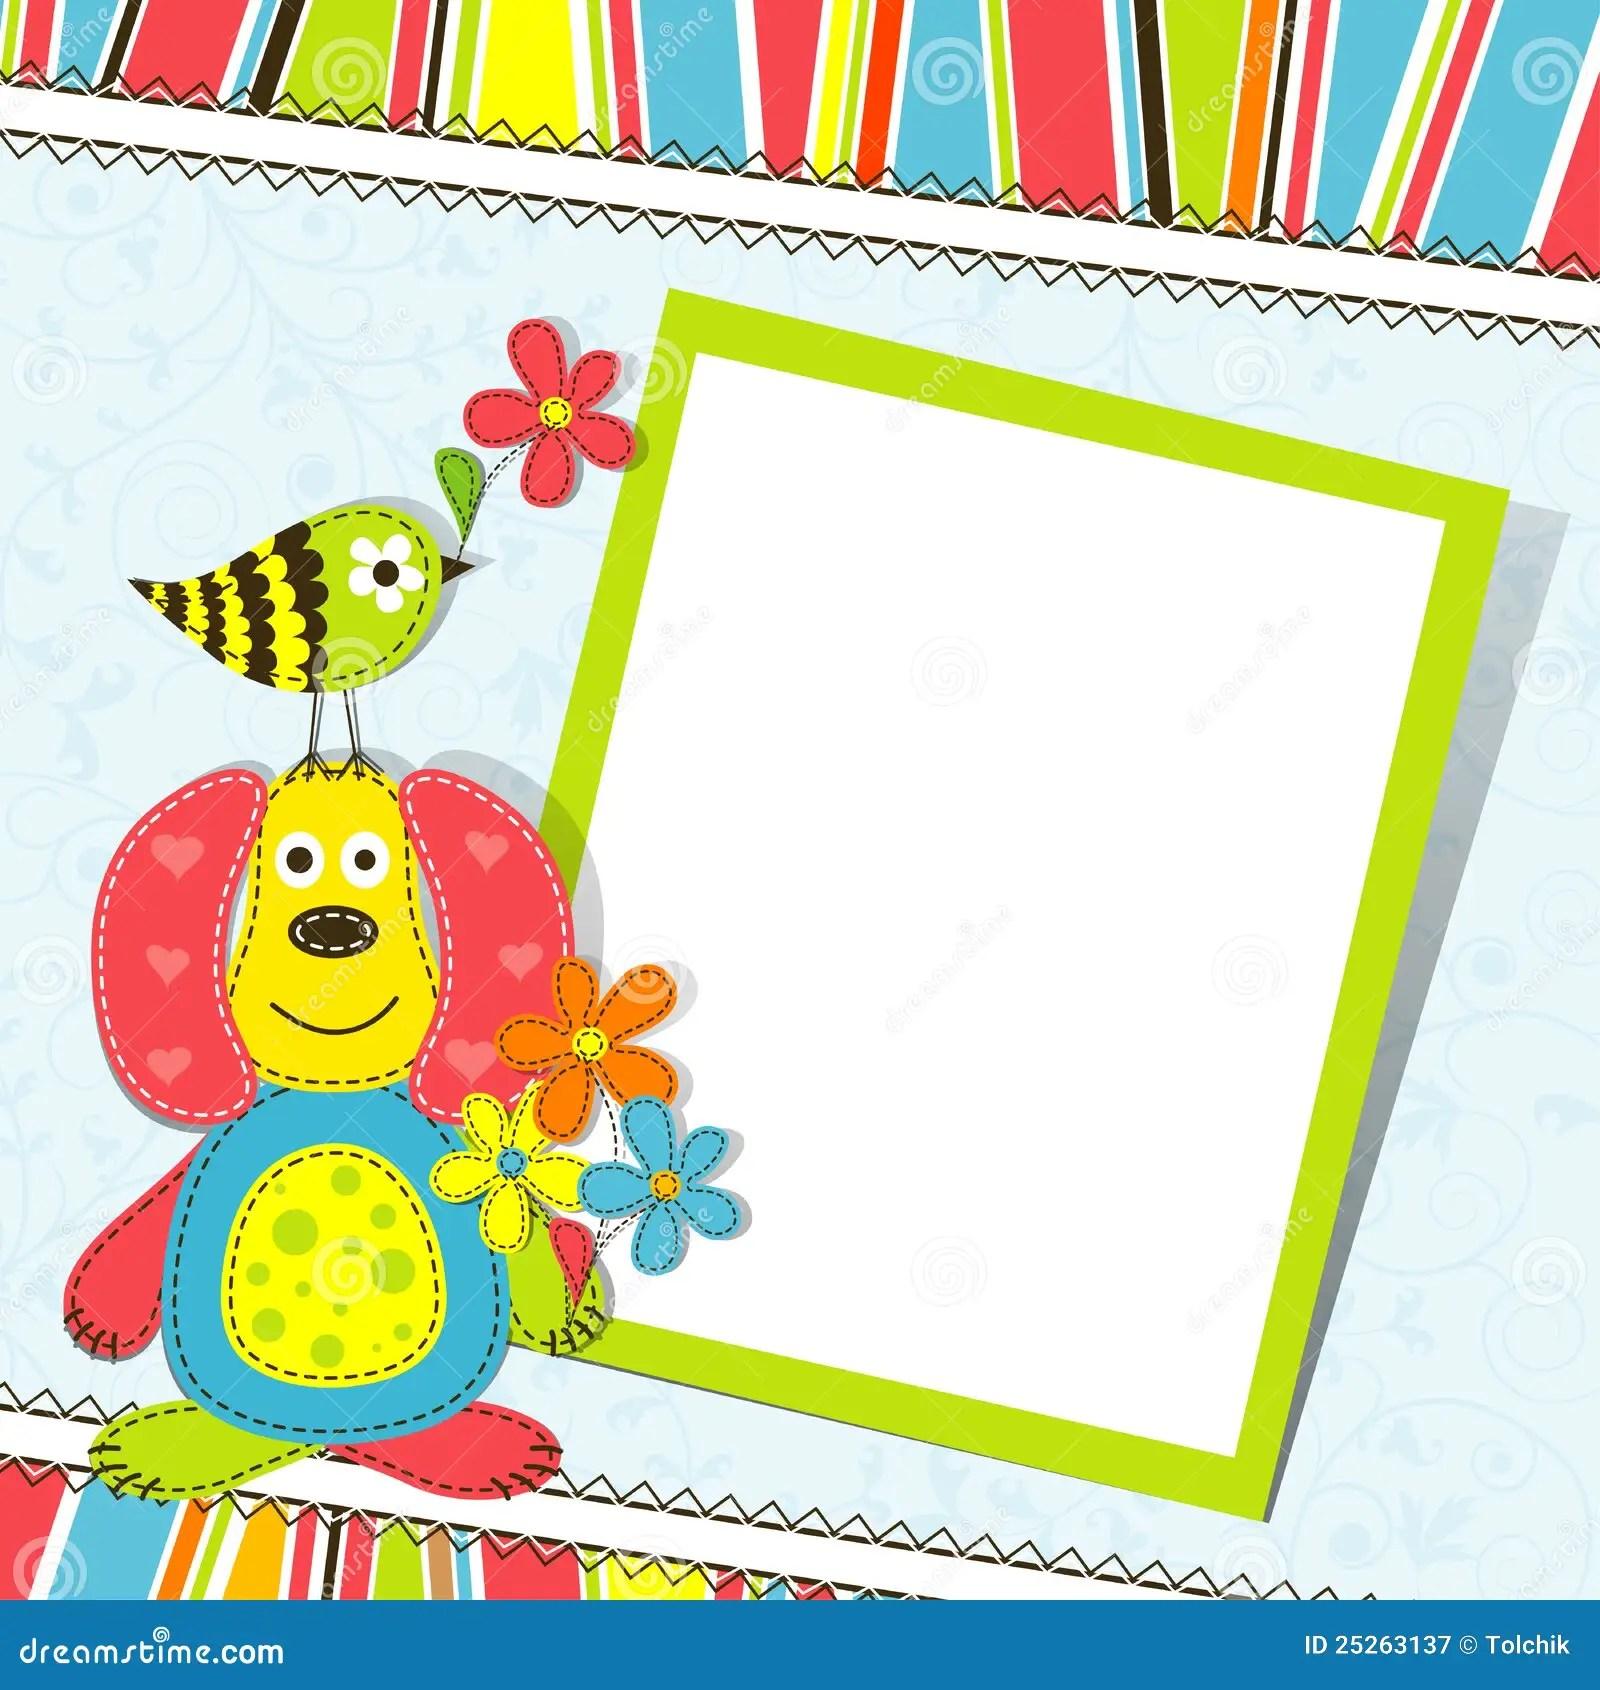 floral garden psddesk com 900 x 582 jpeg 108kb christmas card by – Free Blank Greeting Card Templates